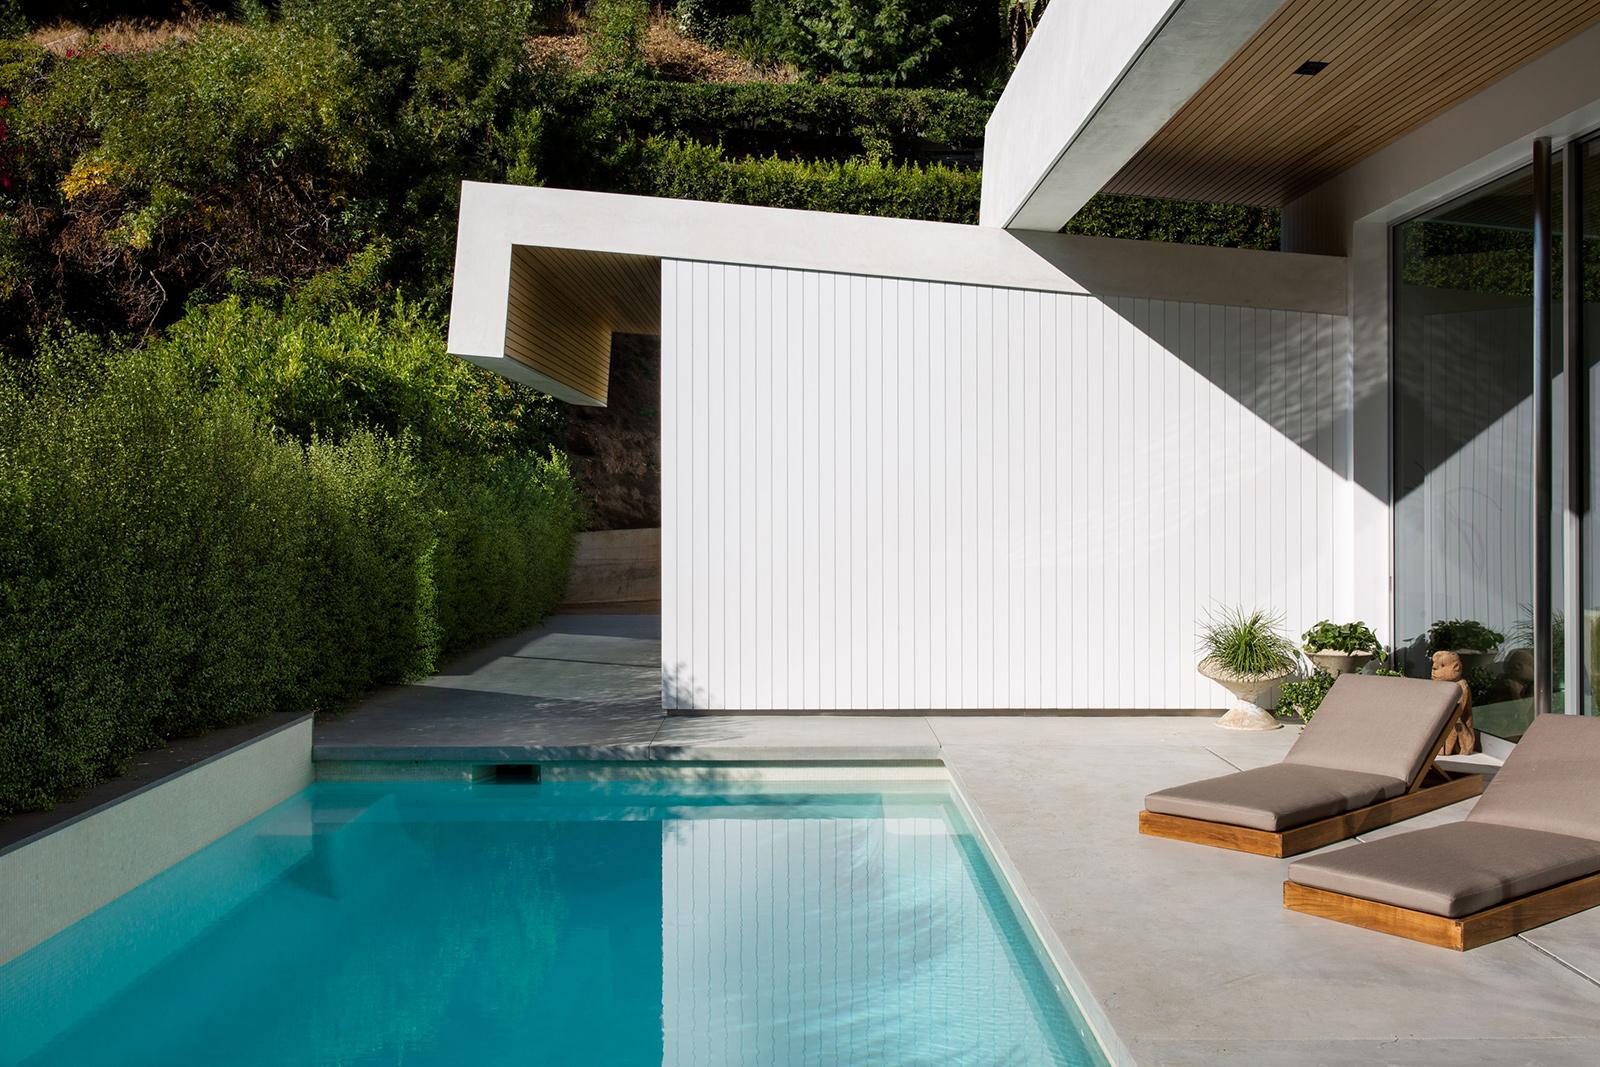 Jason Statham lists his Los Angeles midcentury home